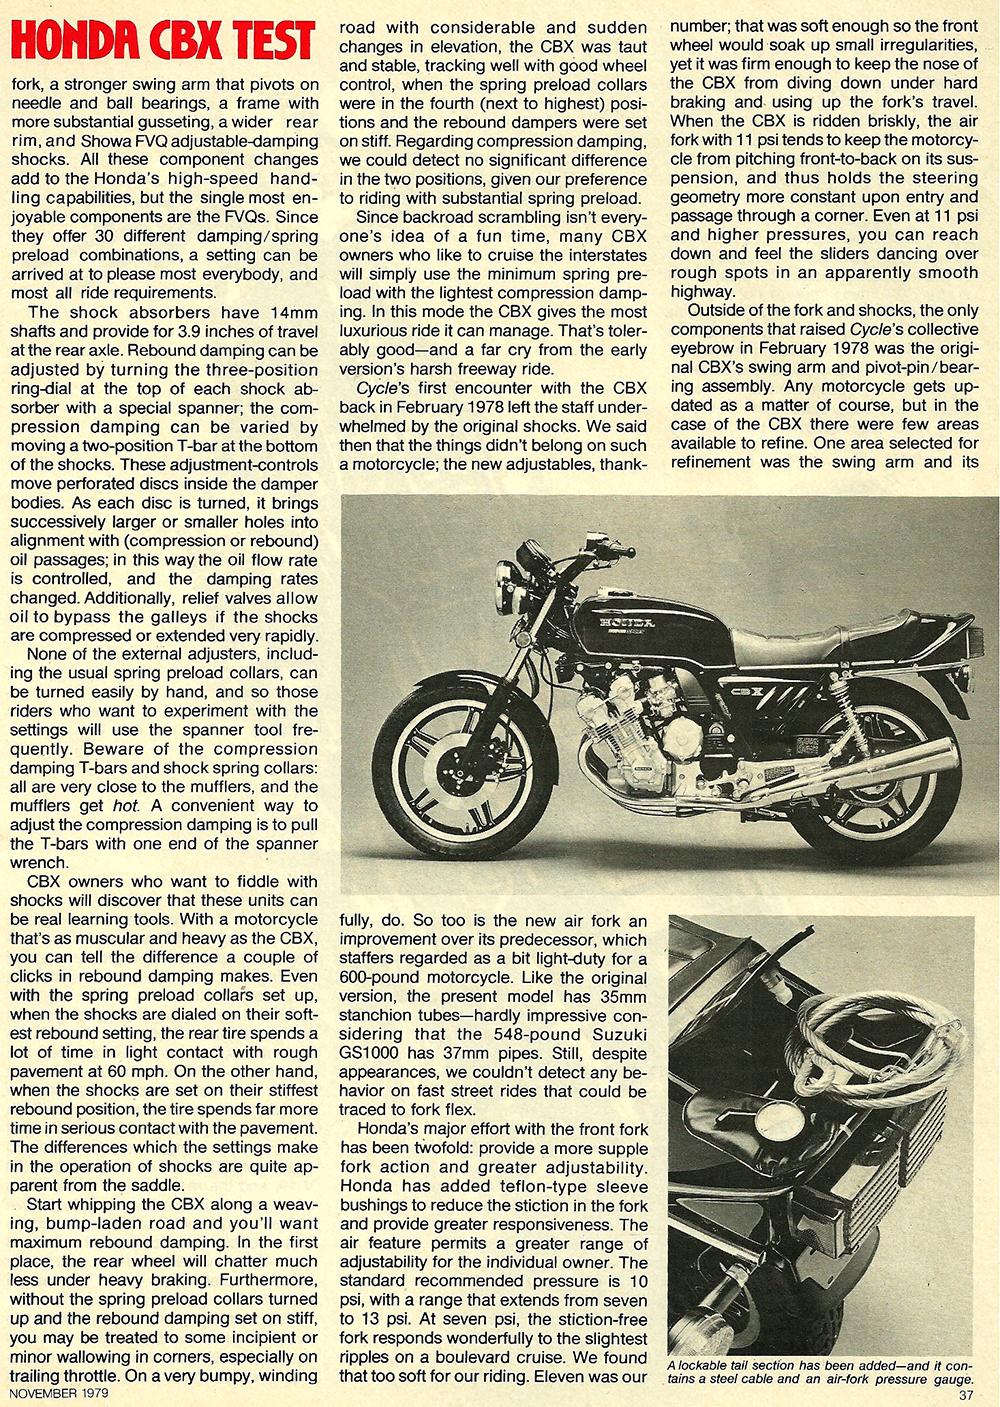 1979 Honda CBX road test 05.jpg